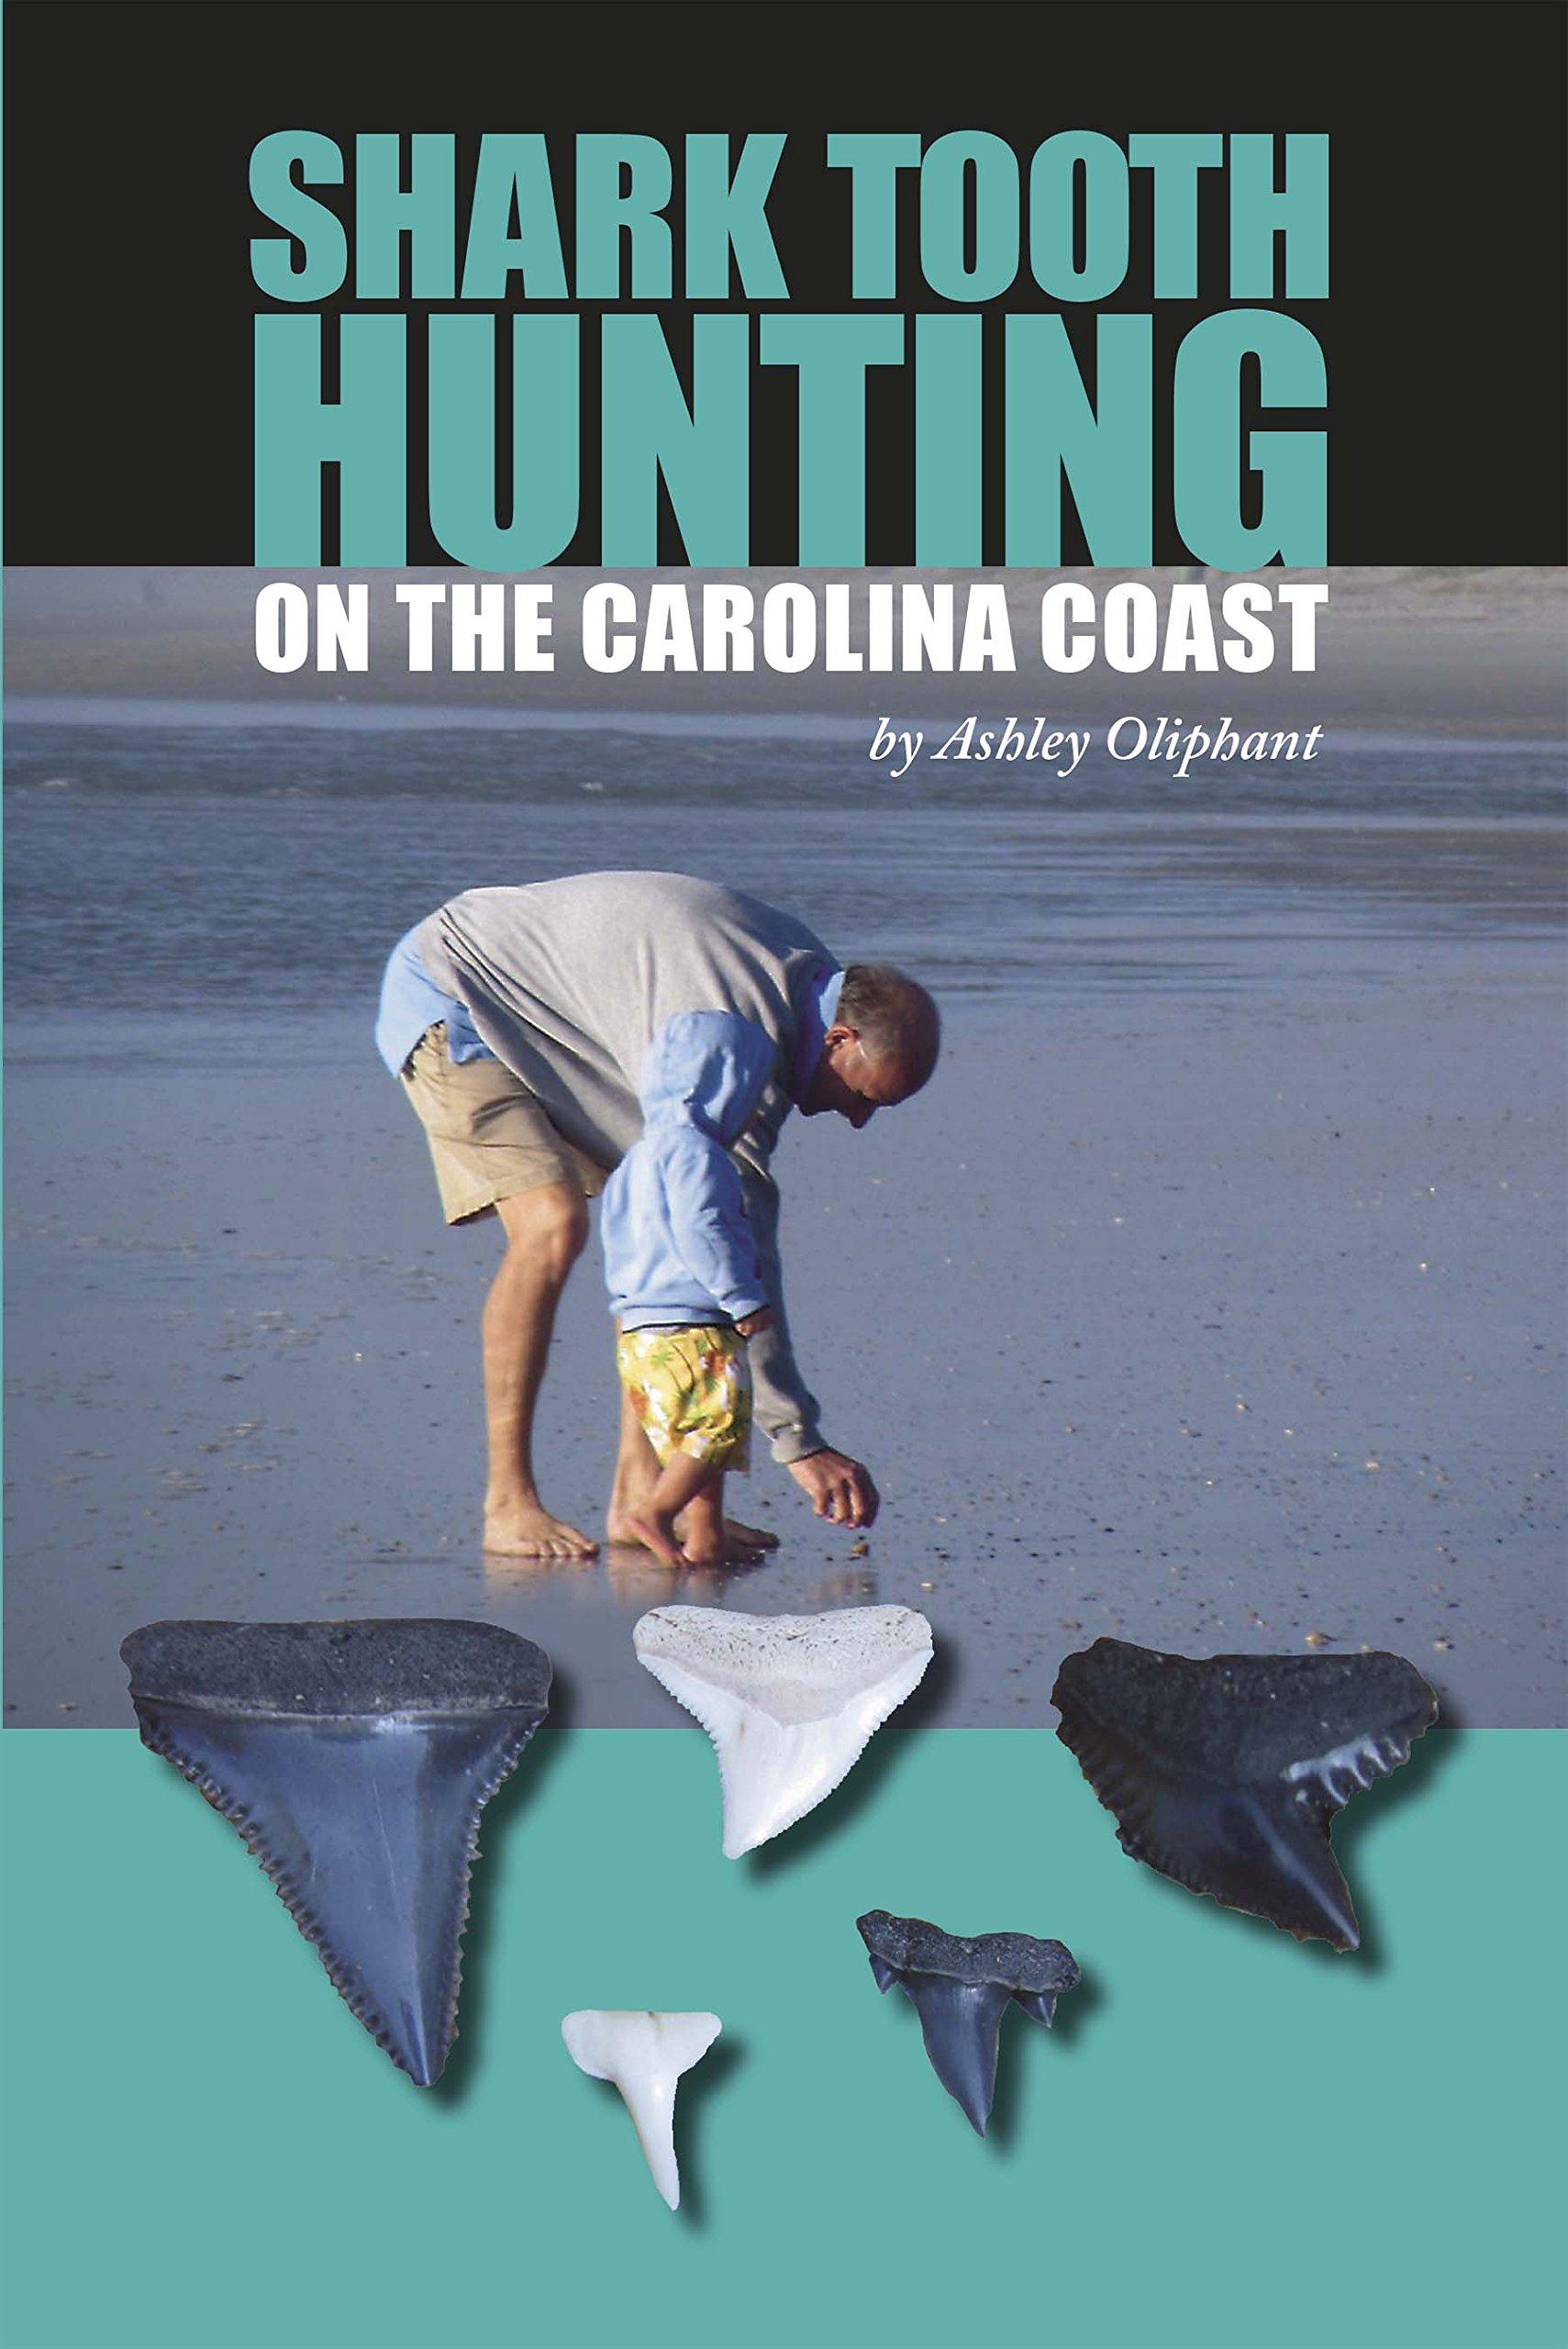 Shark Tooth Hunting Carolina Coast